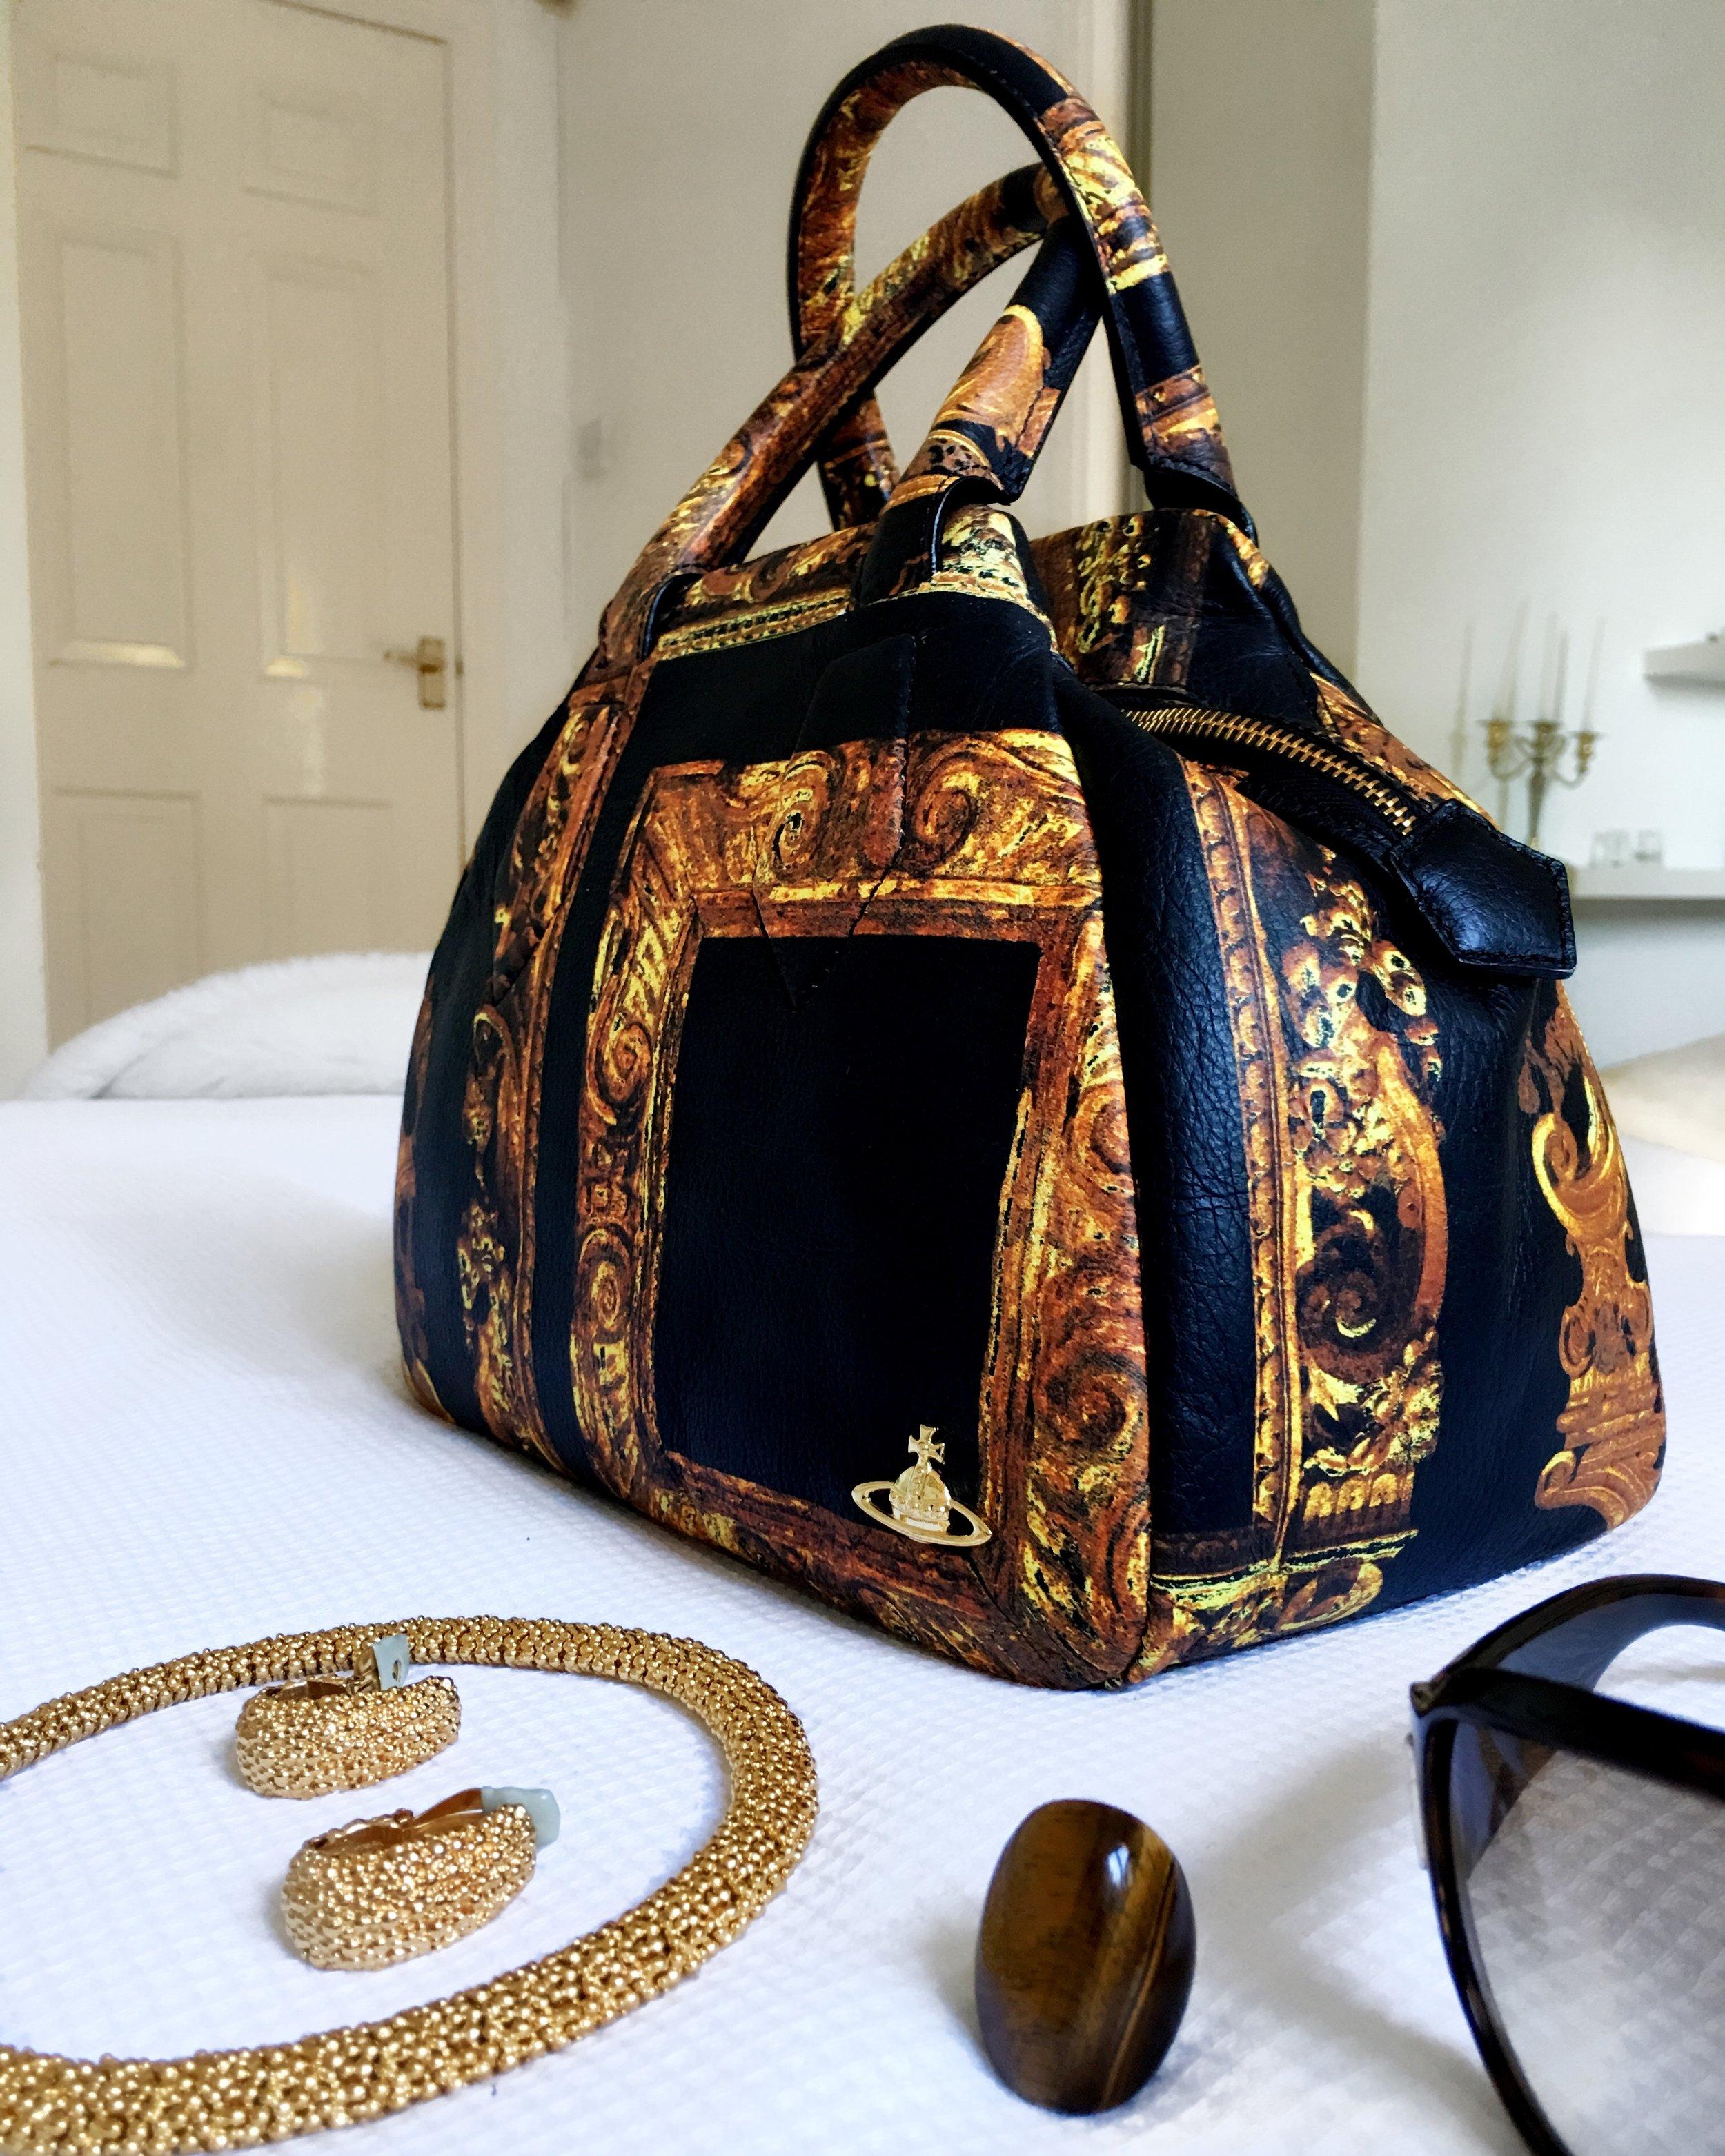 Click to shop this Vivienne Westwood handbag